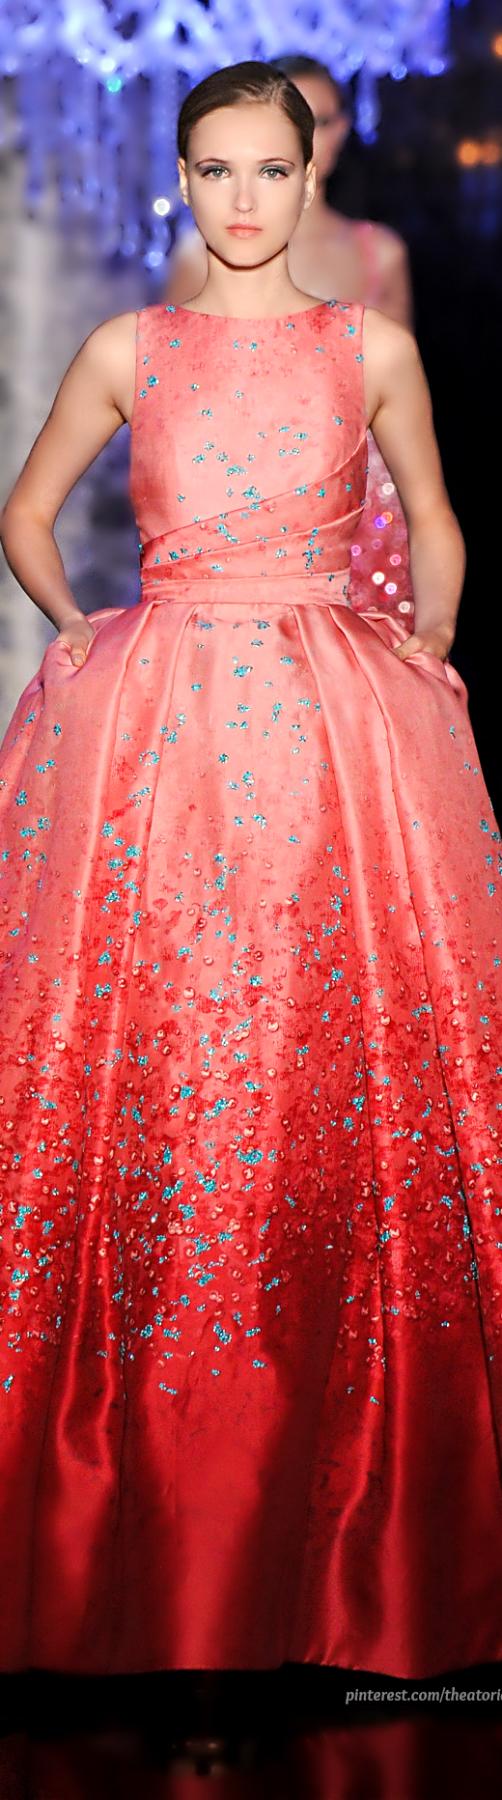 Elie Saab ● Haute Couture FW 2014-2015 #sweet #romance